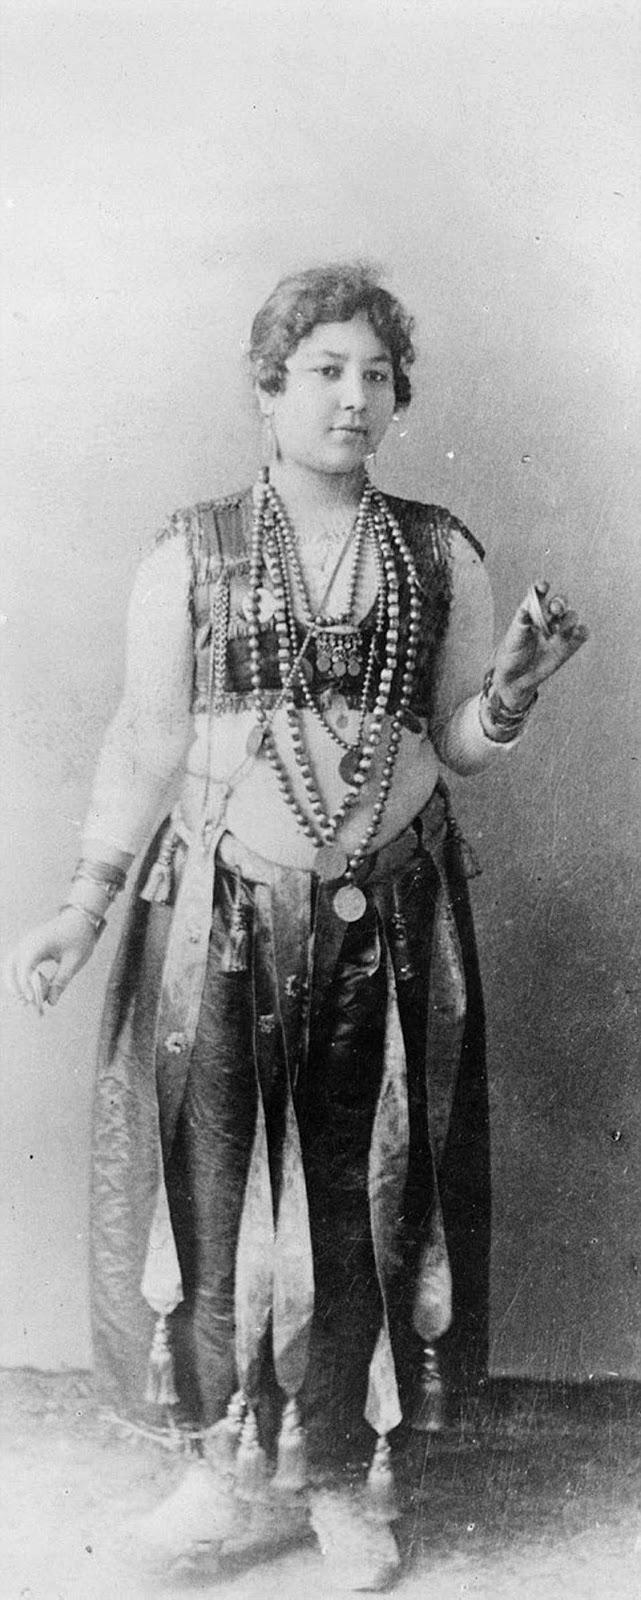 An Egyptian dancing girl at the World's Columbian Exposition, Chicago, Illinois, USA, circa 1893.